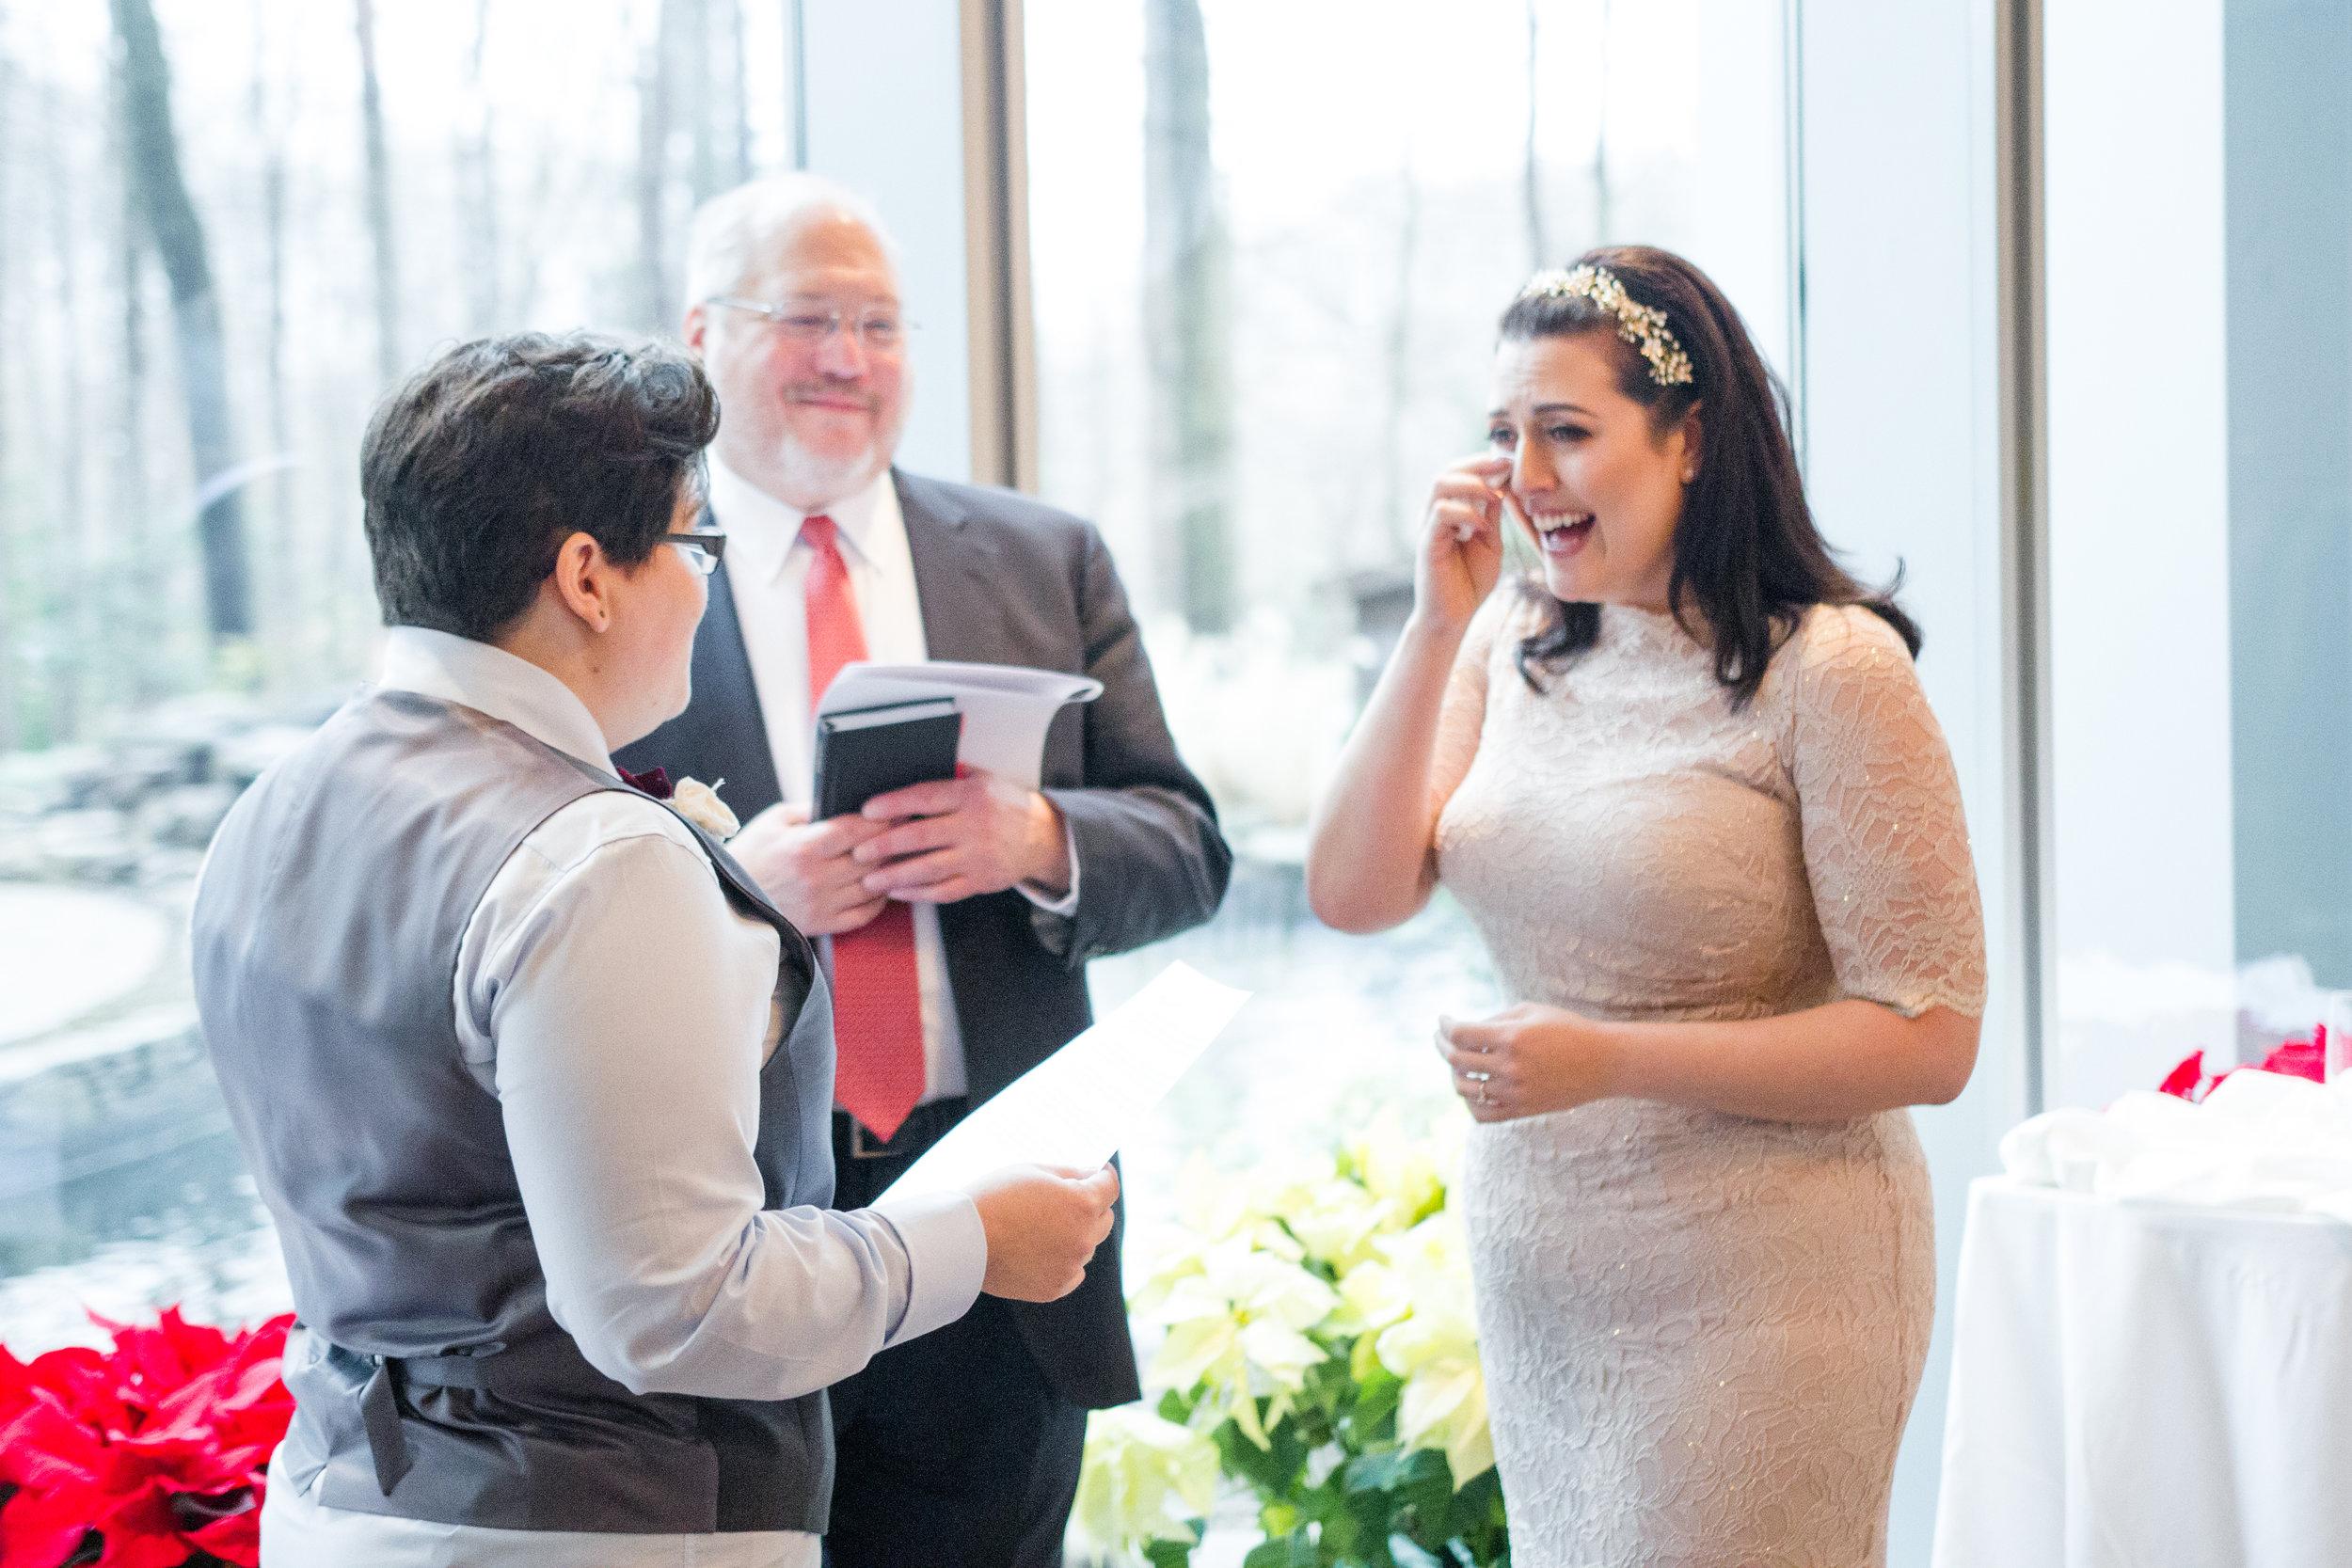 Jenn and Bek | 2941 Restaurant Wedding | Falls Church Wedding Photographer | Maral Noori Photography | Virginia Same Sex Photographer | Virginia LGBTQ Wedding | DC LGBTQ Photographer